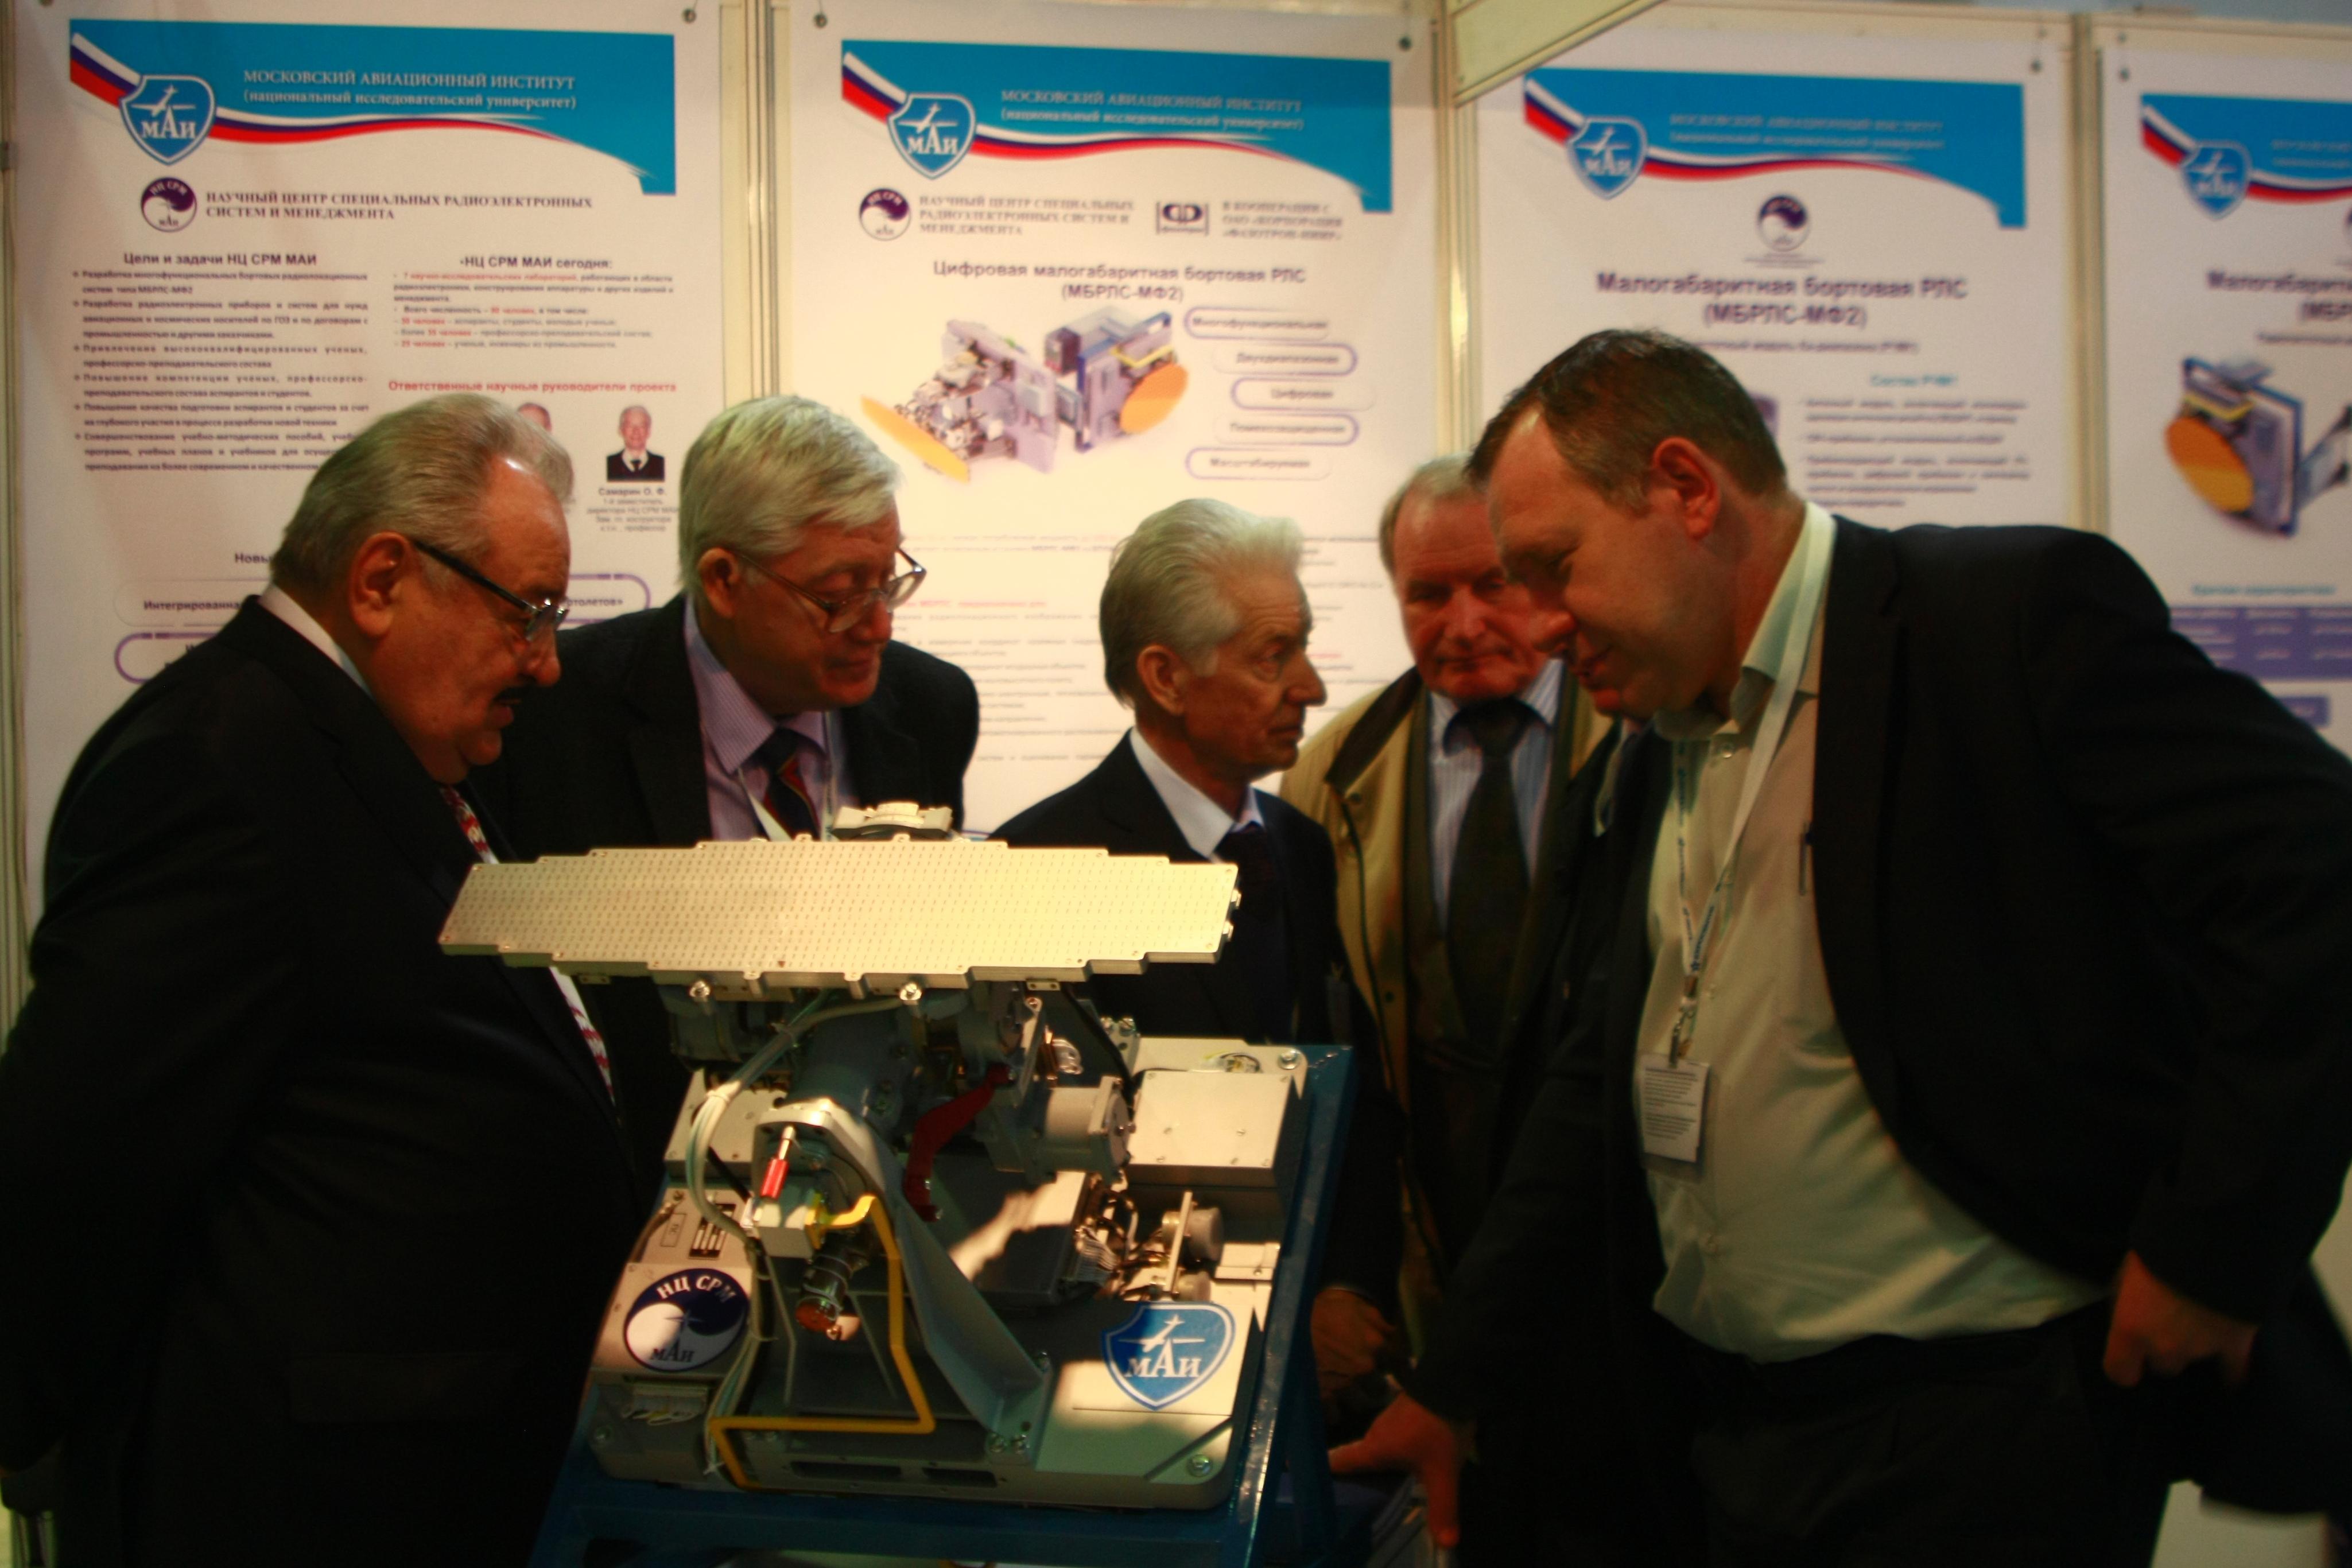 Finmeccanica  تعرض طائرات و  مروحيات على الجزائر  Mg_6072